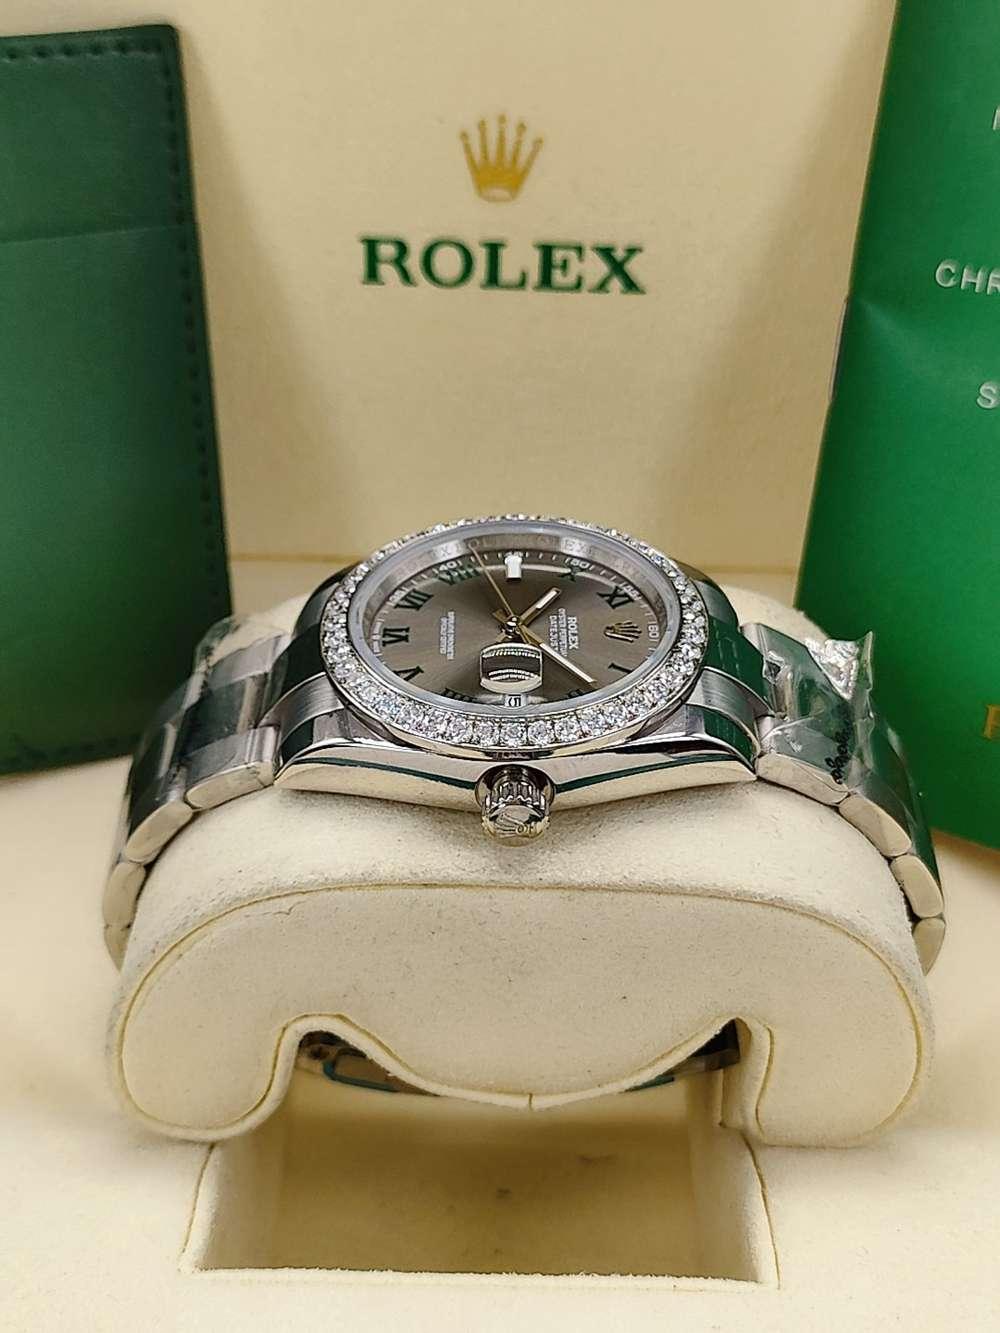 Datejust 36mm diamonds bezel silver case gray dial Roman numbers AAA automatic women S